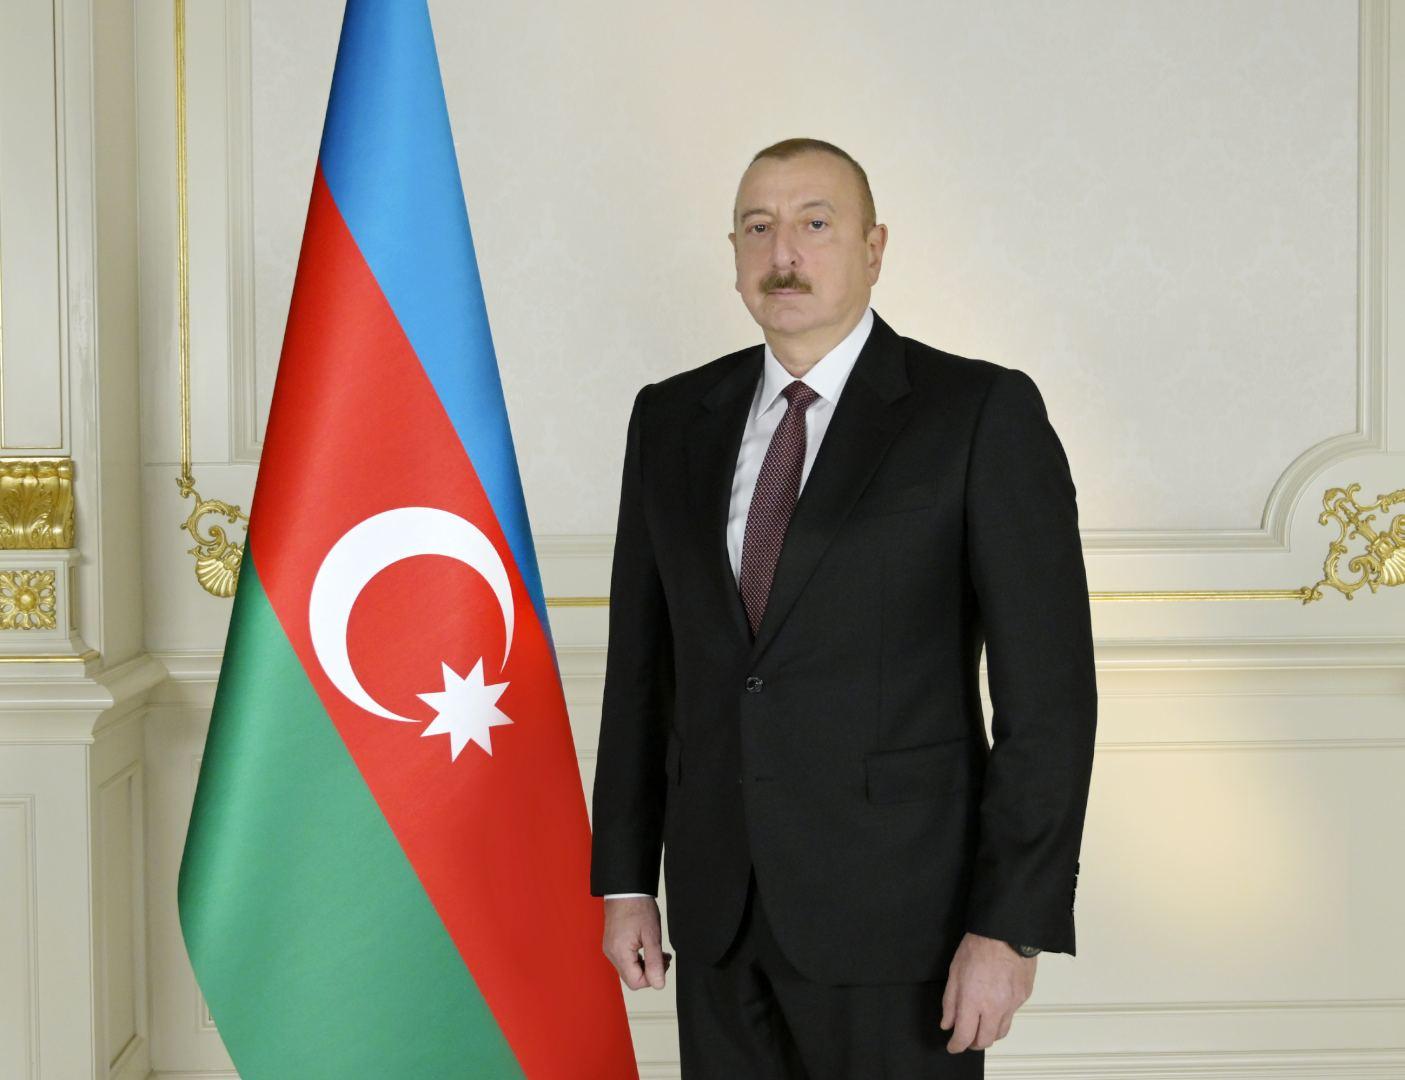 President Ilham Aliyev lays the foundation for a tunnel on Ahmadbayli-Fuzuli-Shusha highway